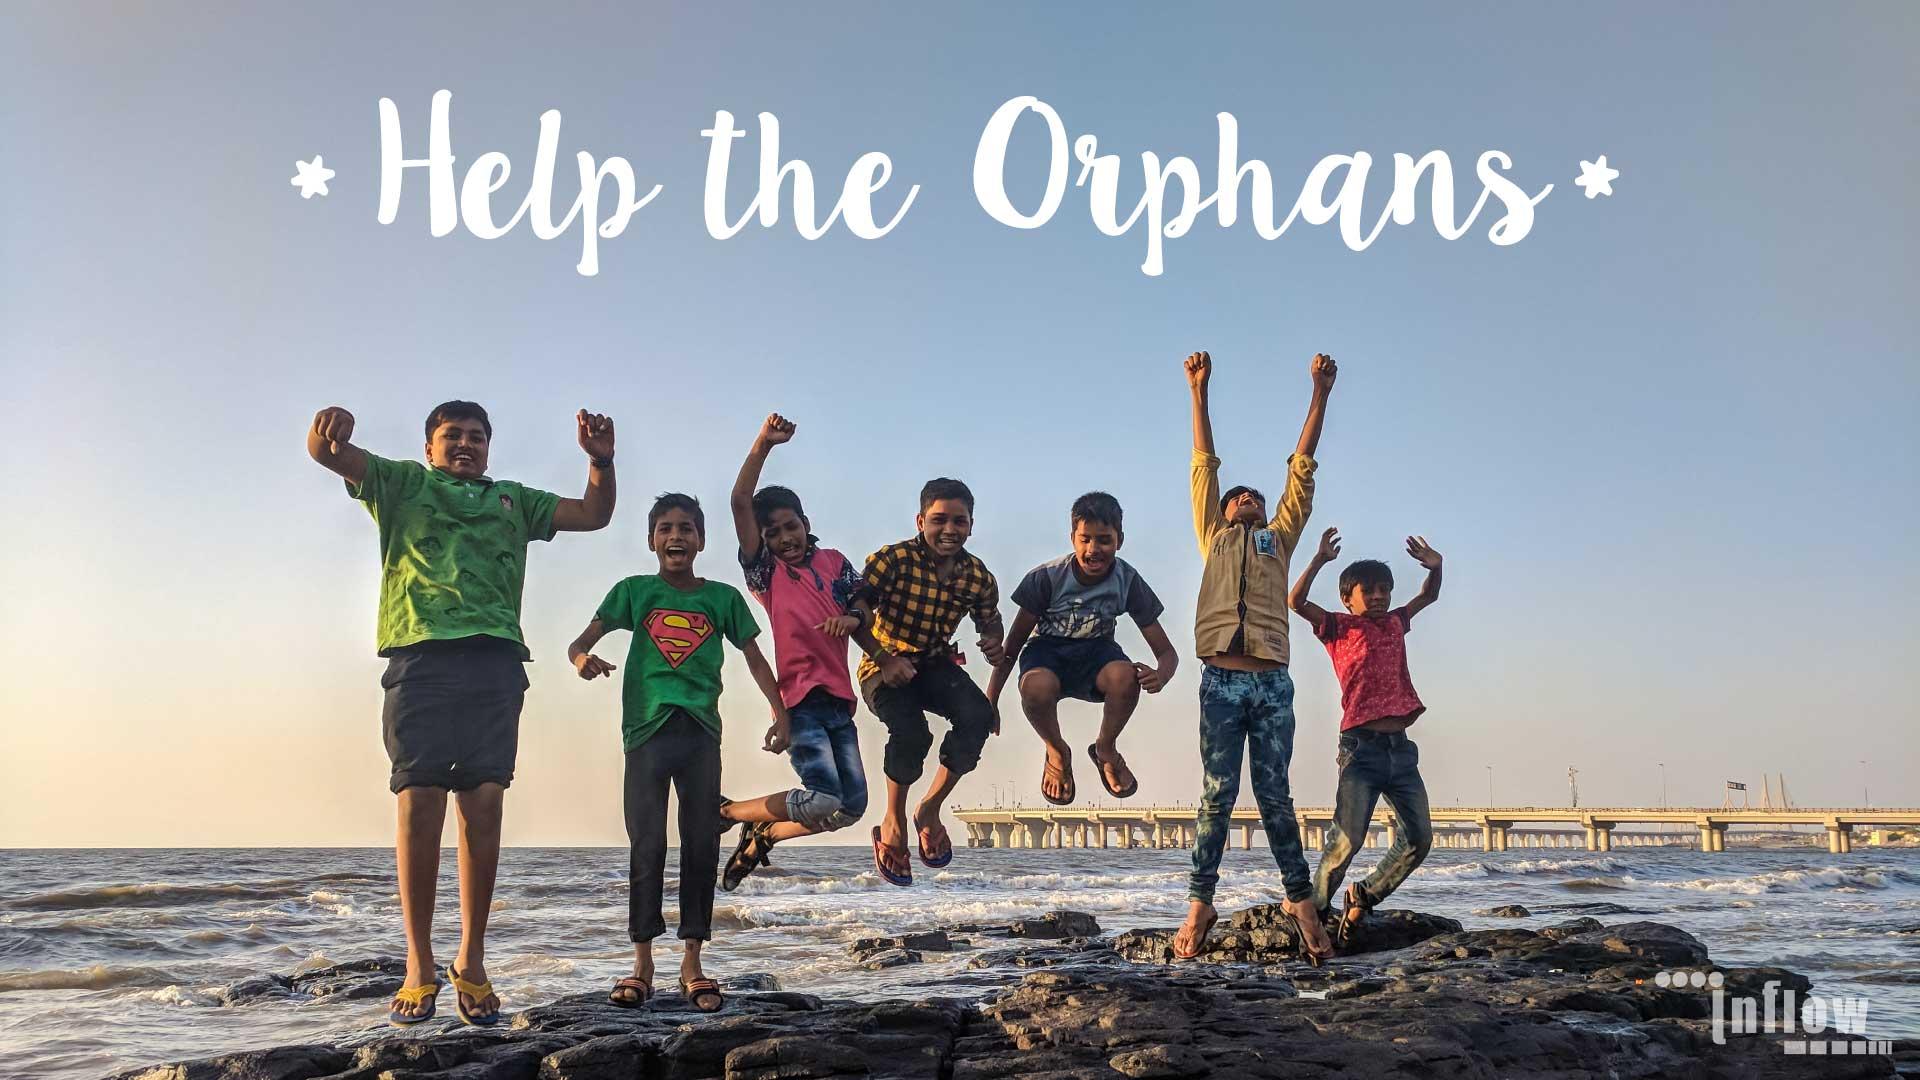 help-the-orphans-csr-activity